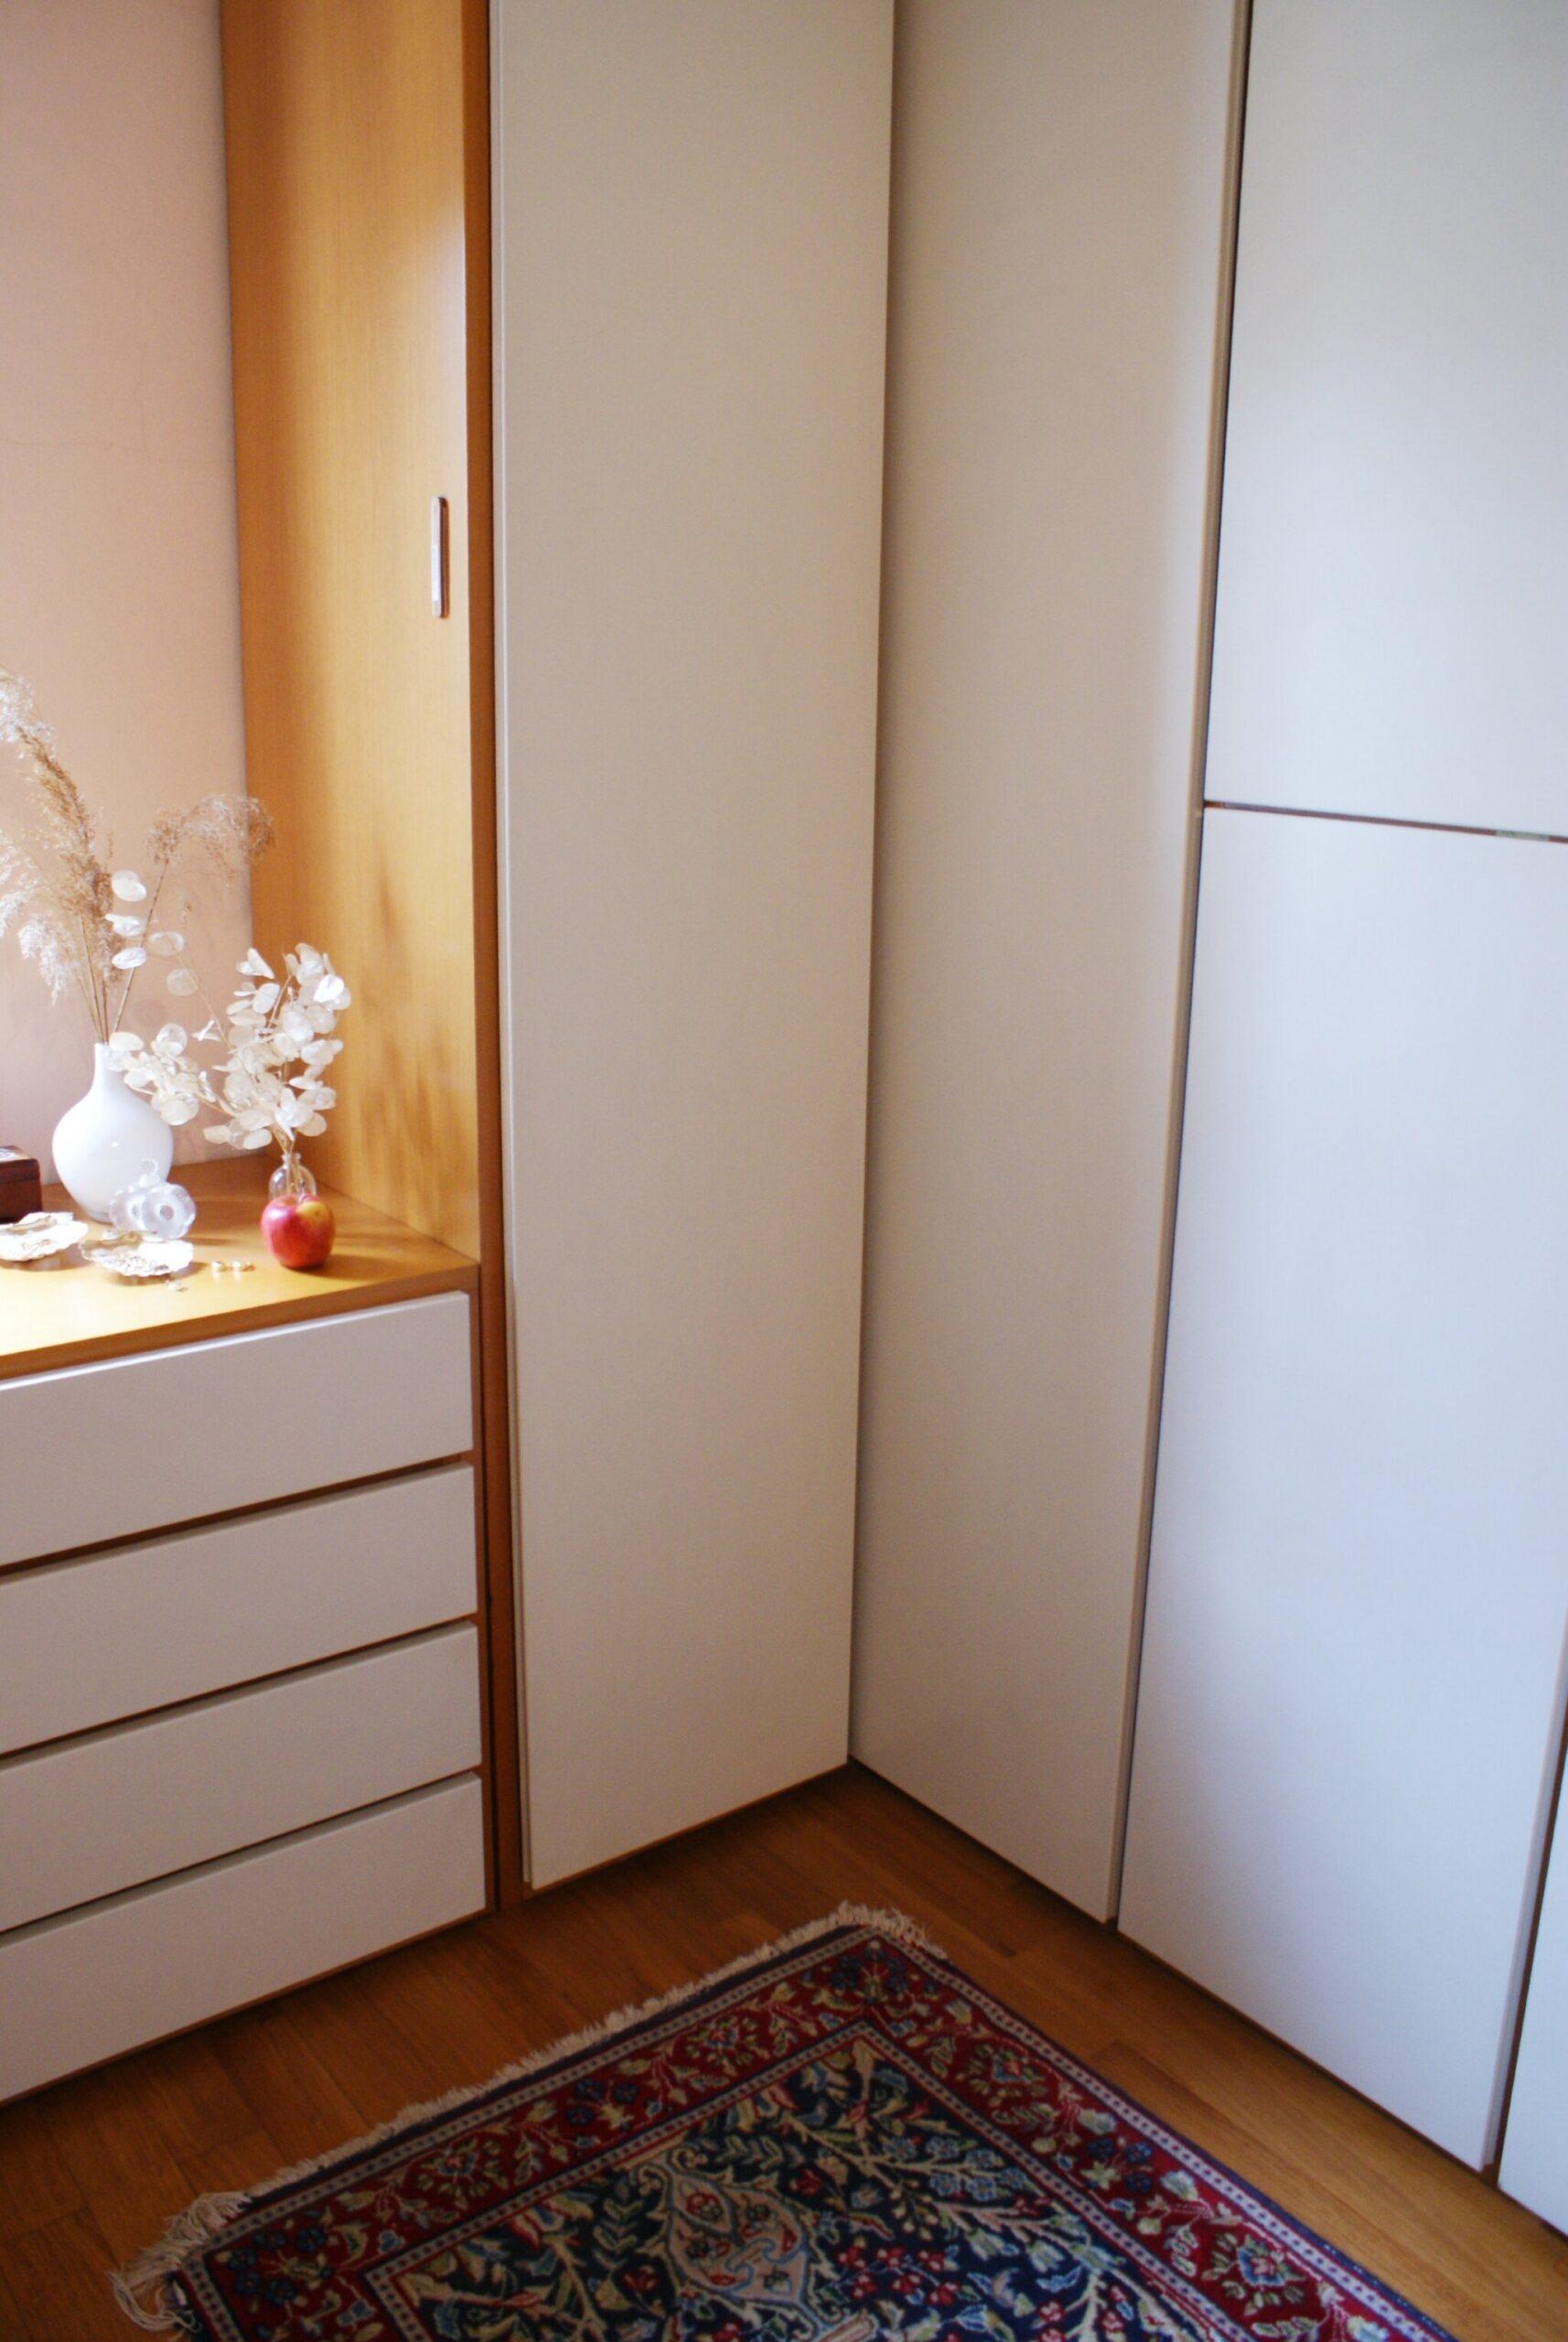 kondo declutter organize wardrobe closet tips hacks best